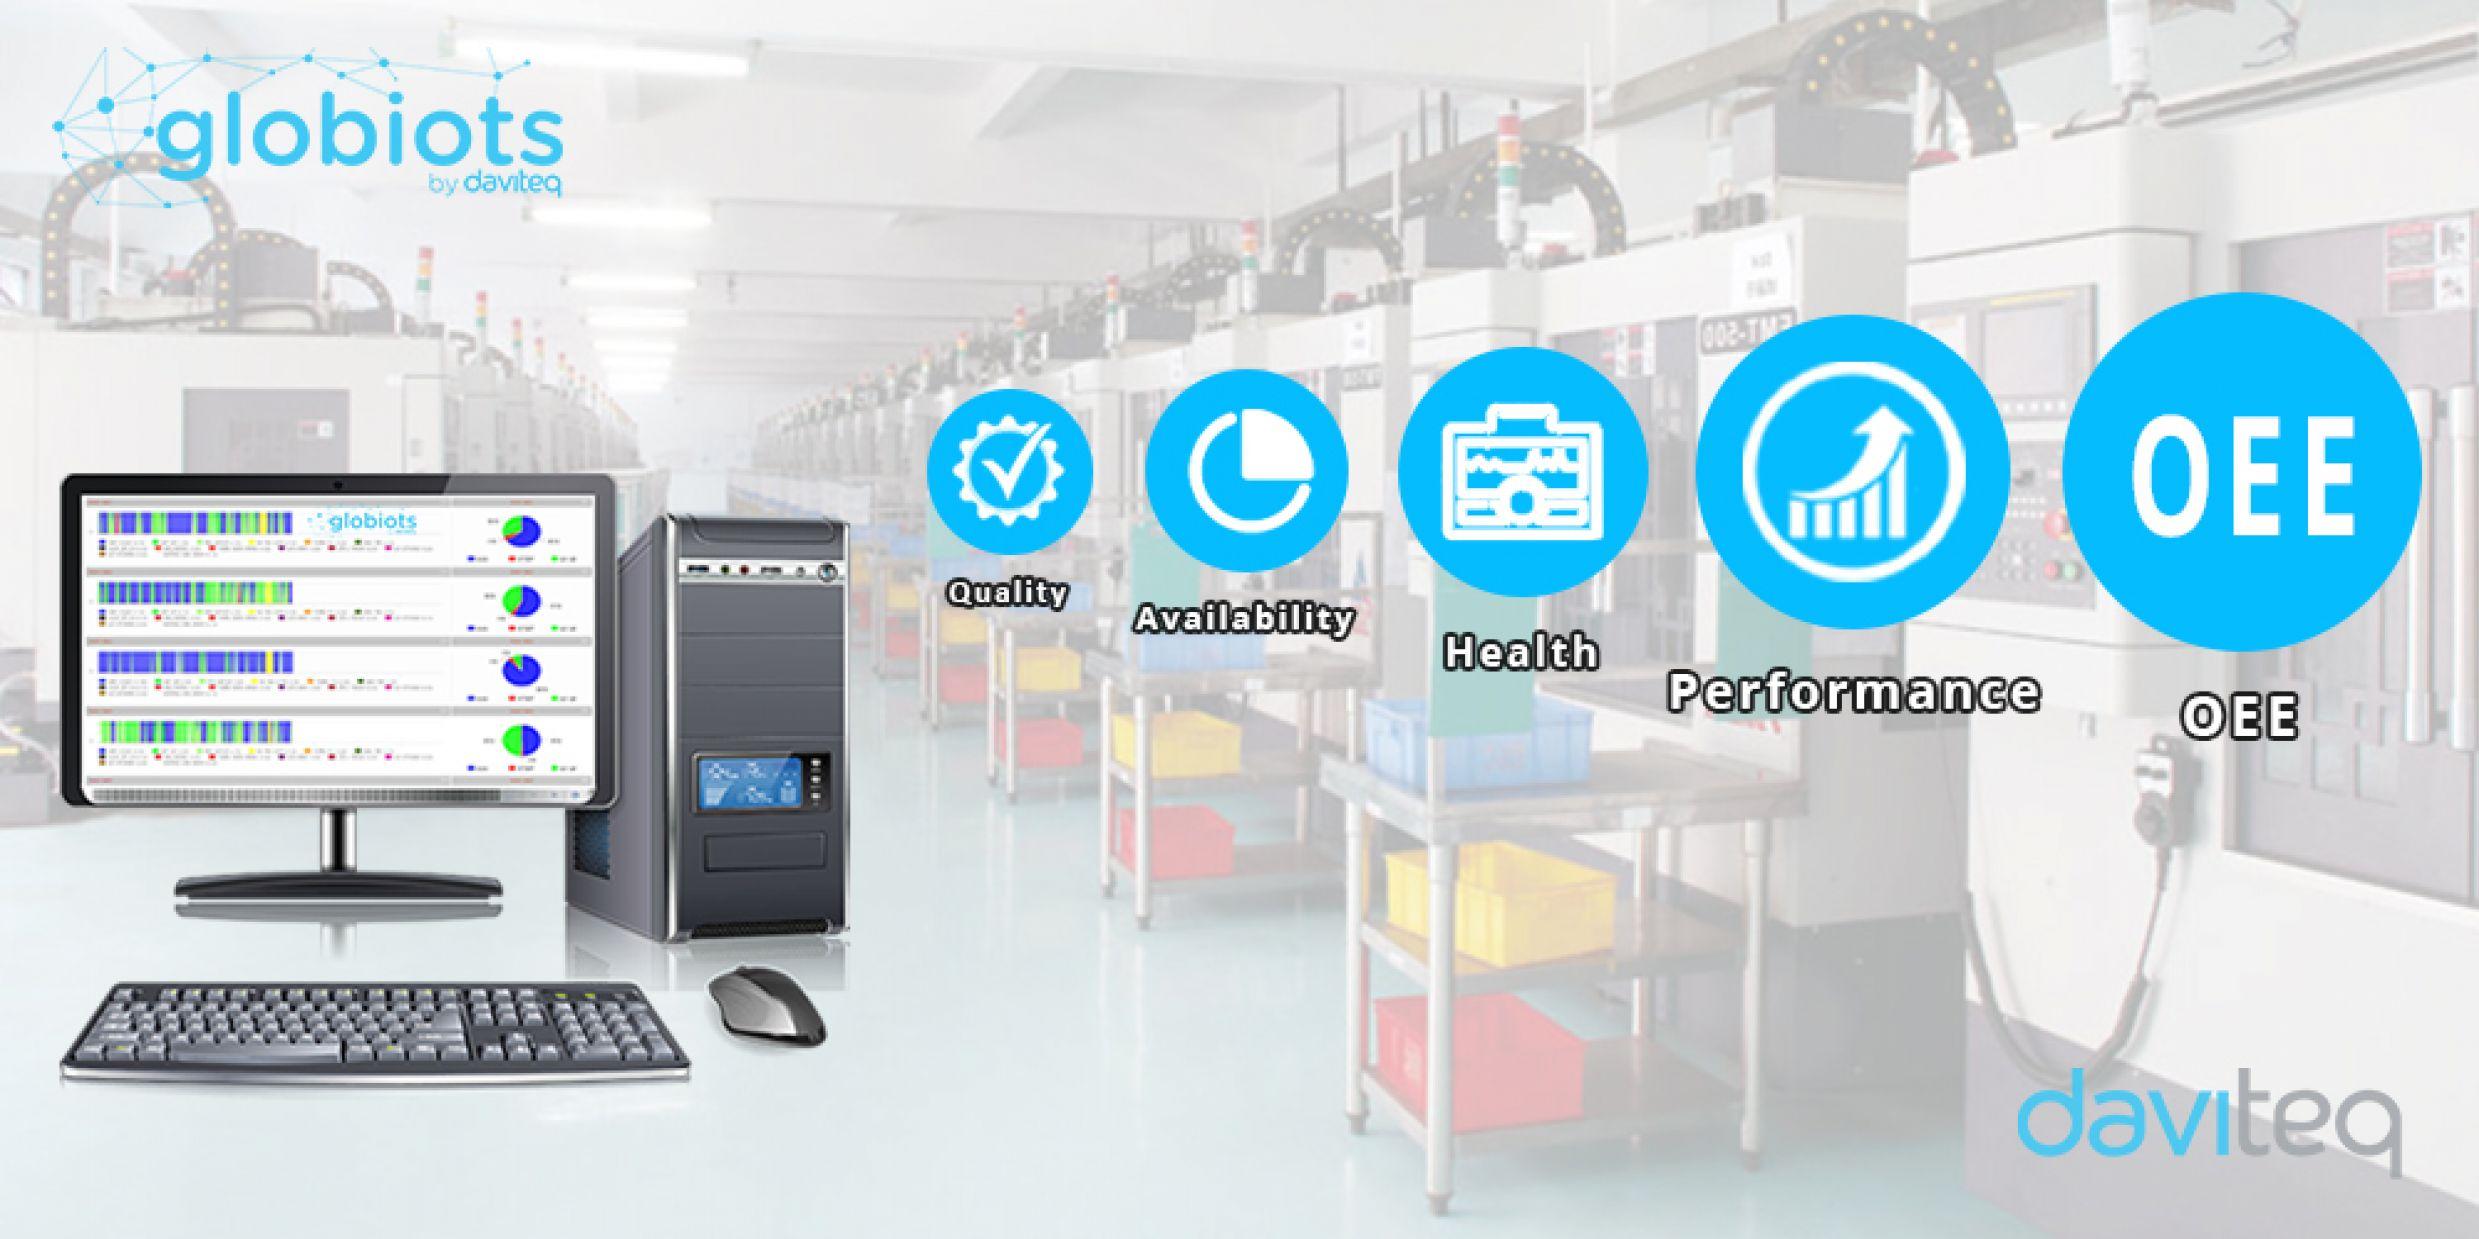 IoT Globiots - Machine tool monitoring solution